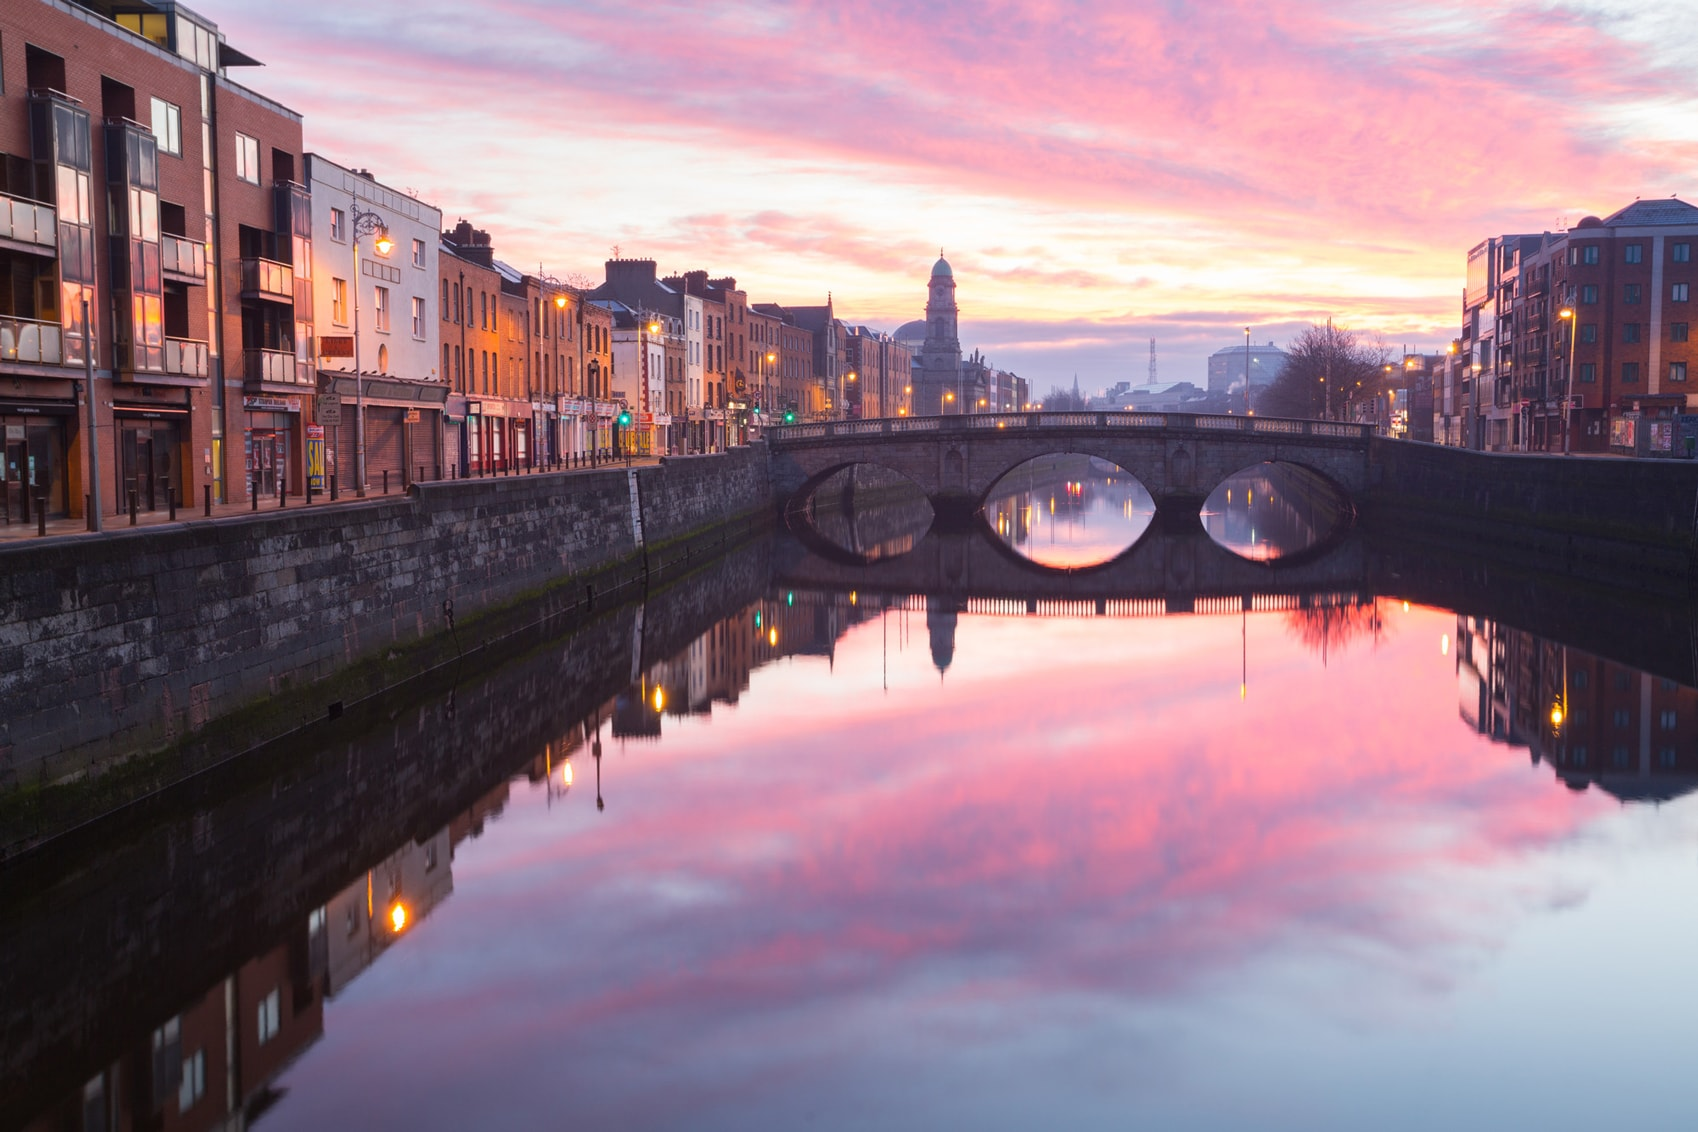 Ireland photos RS10717_Ireland-Dublin-RiverLiffey-559028175-lpr-©-David-Soanes-Photography